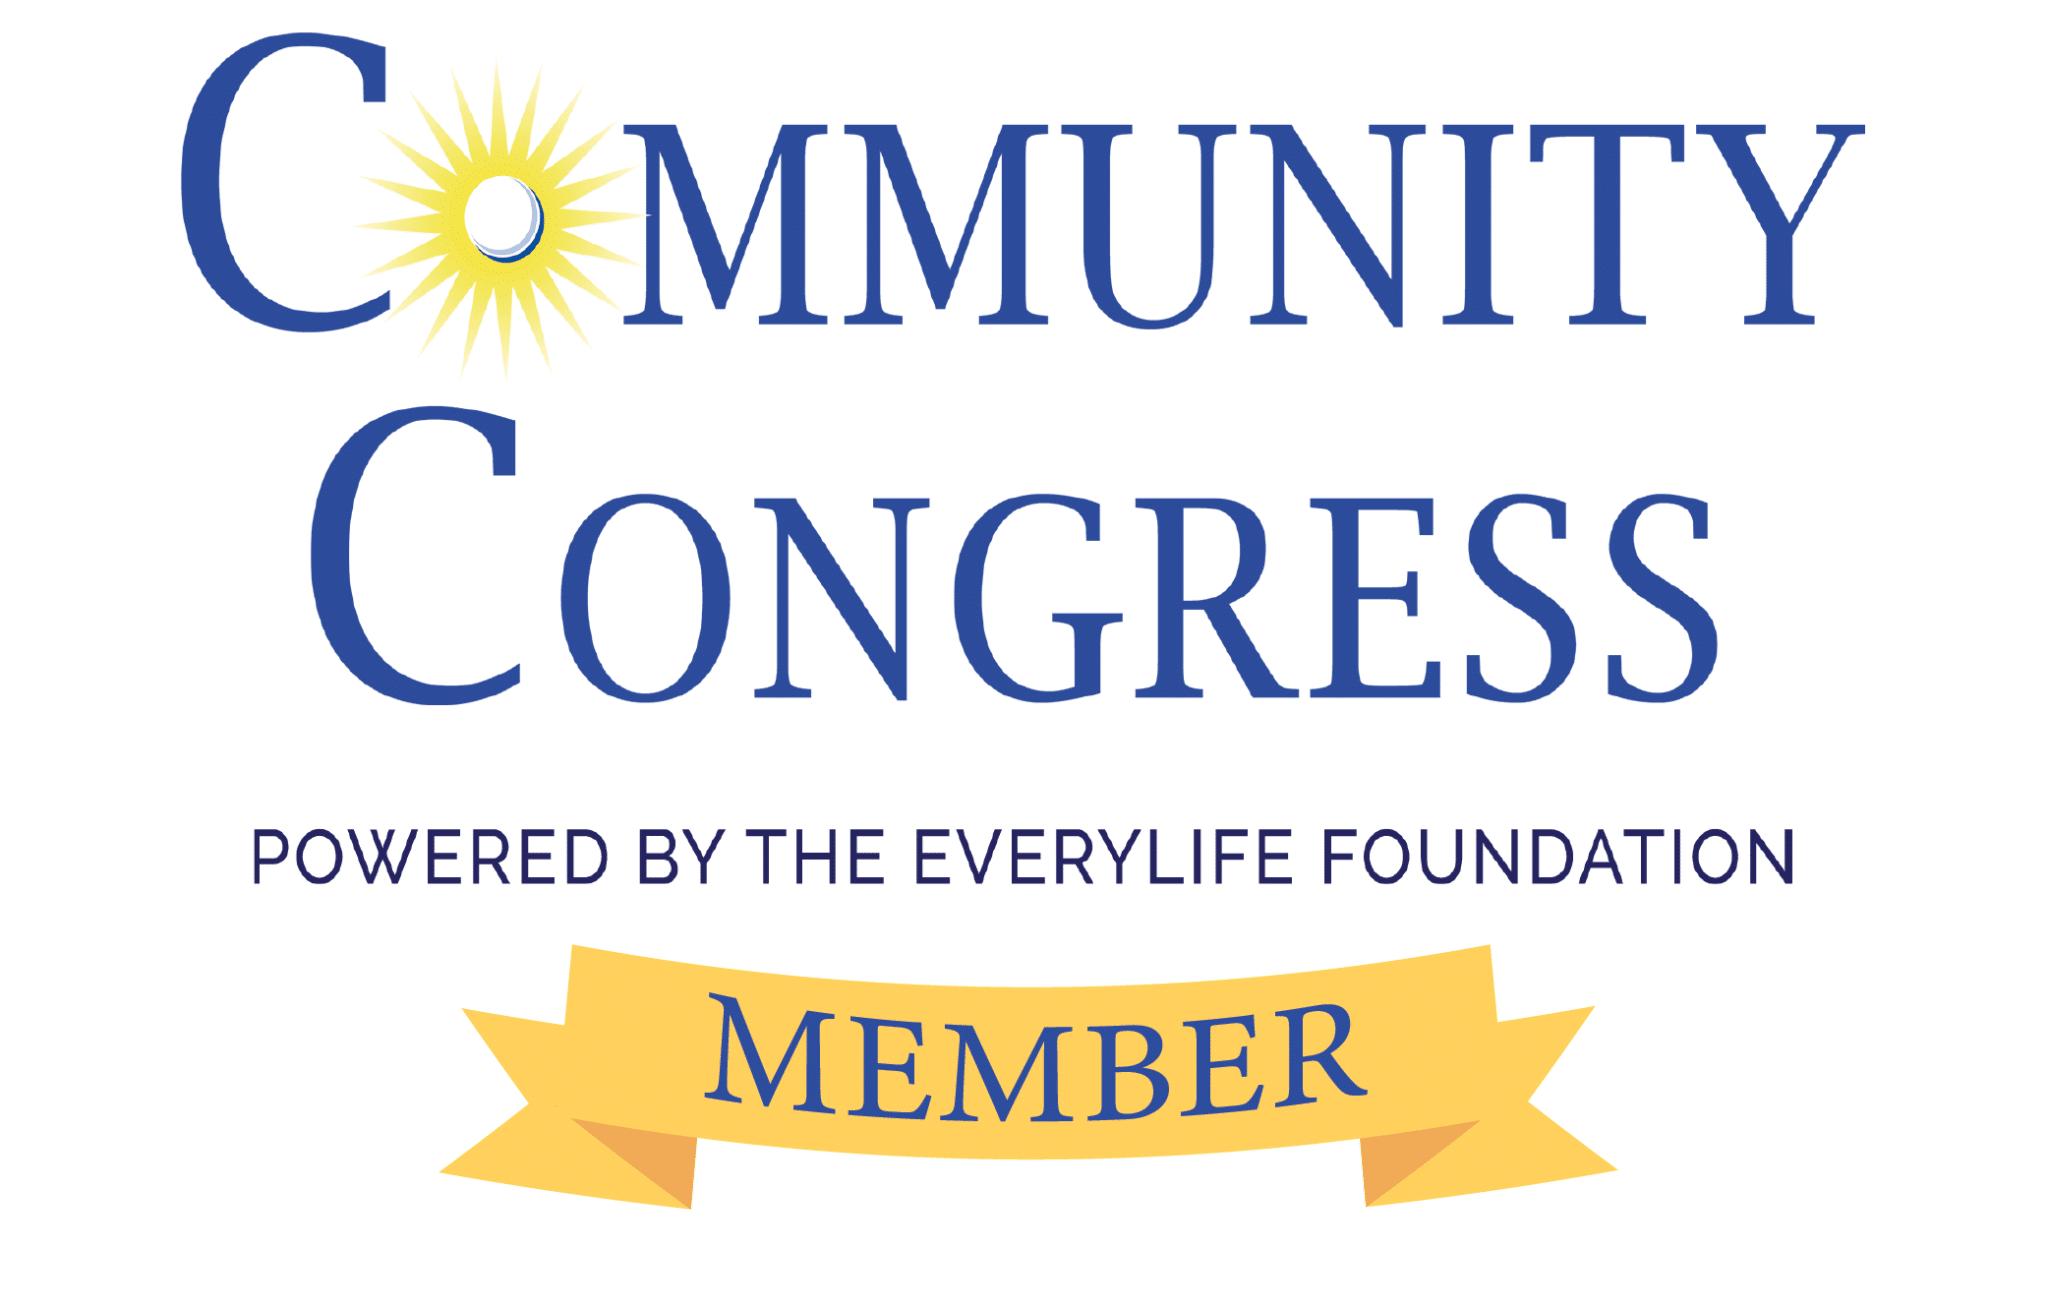 Everyday Life Foundation Community Congress logo